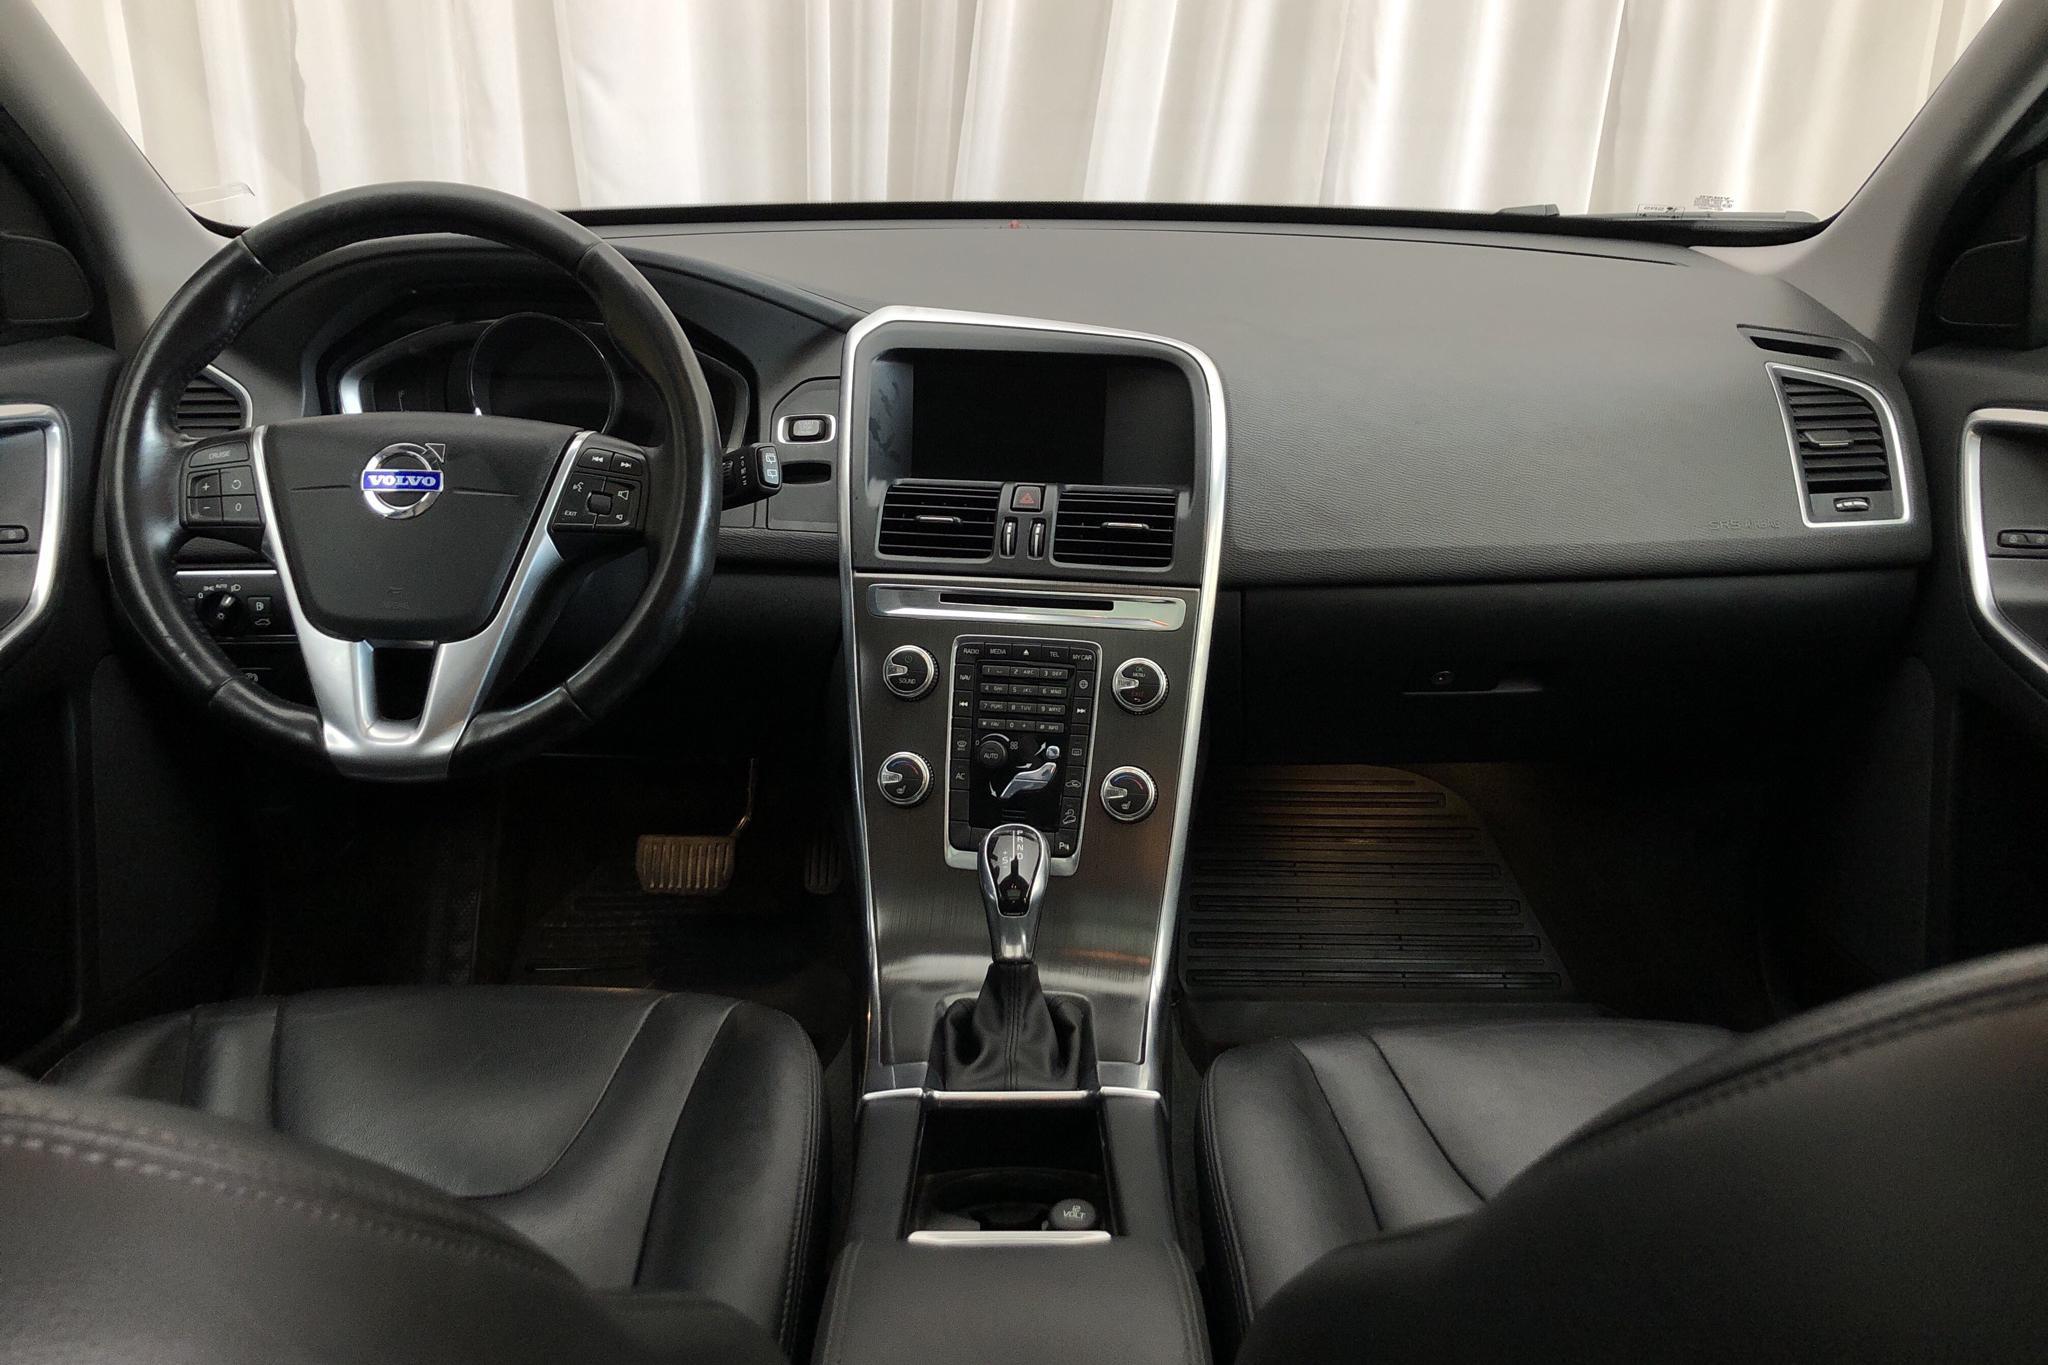 Volvo XC60 D5 AWD (215hk) - 147 980 km - Automatic - black - 2015